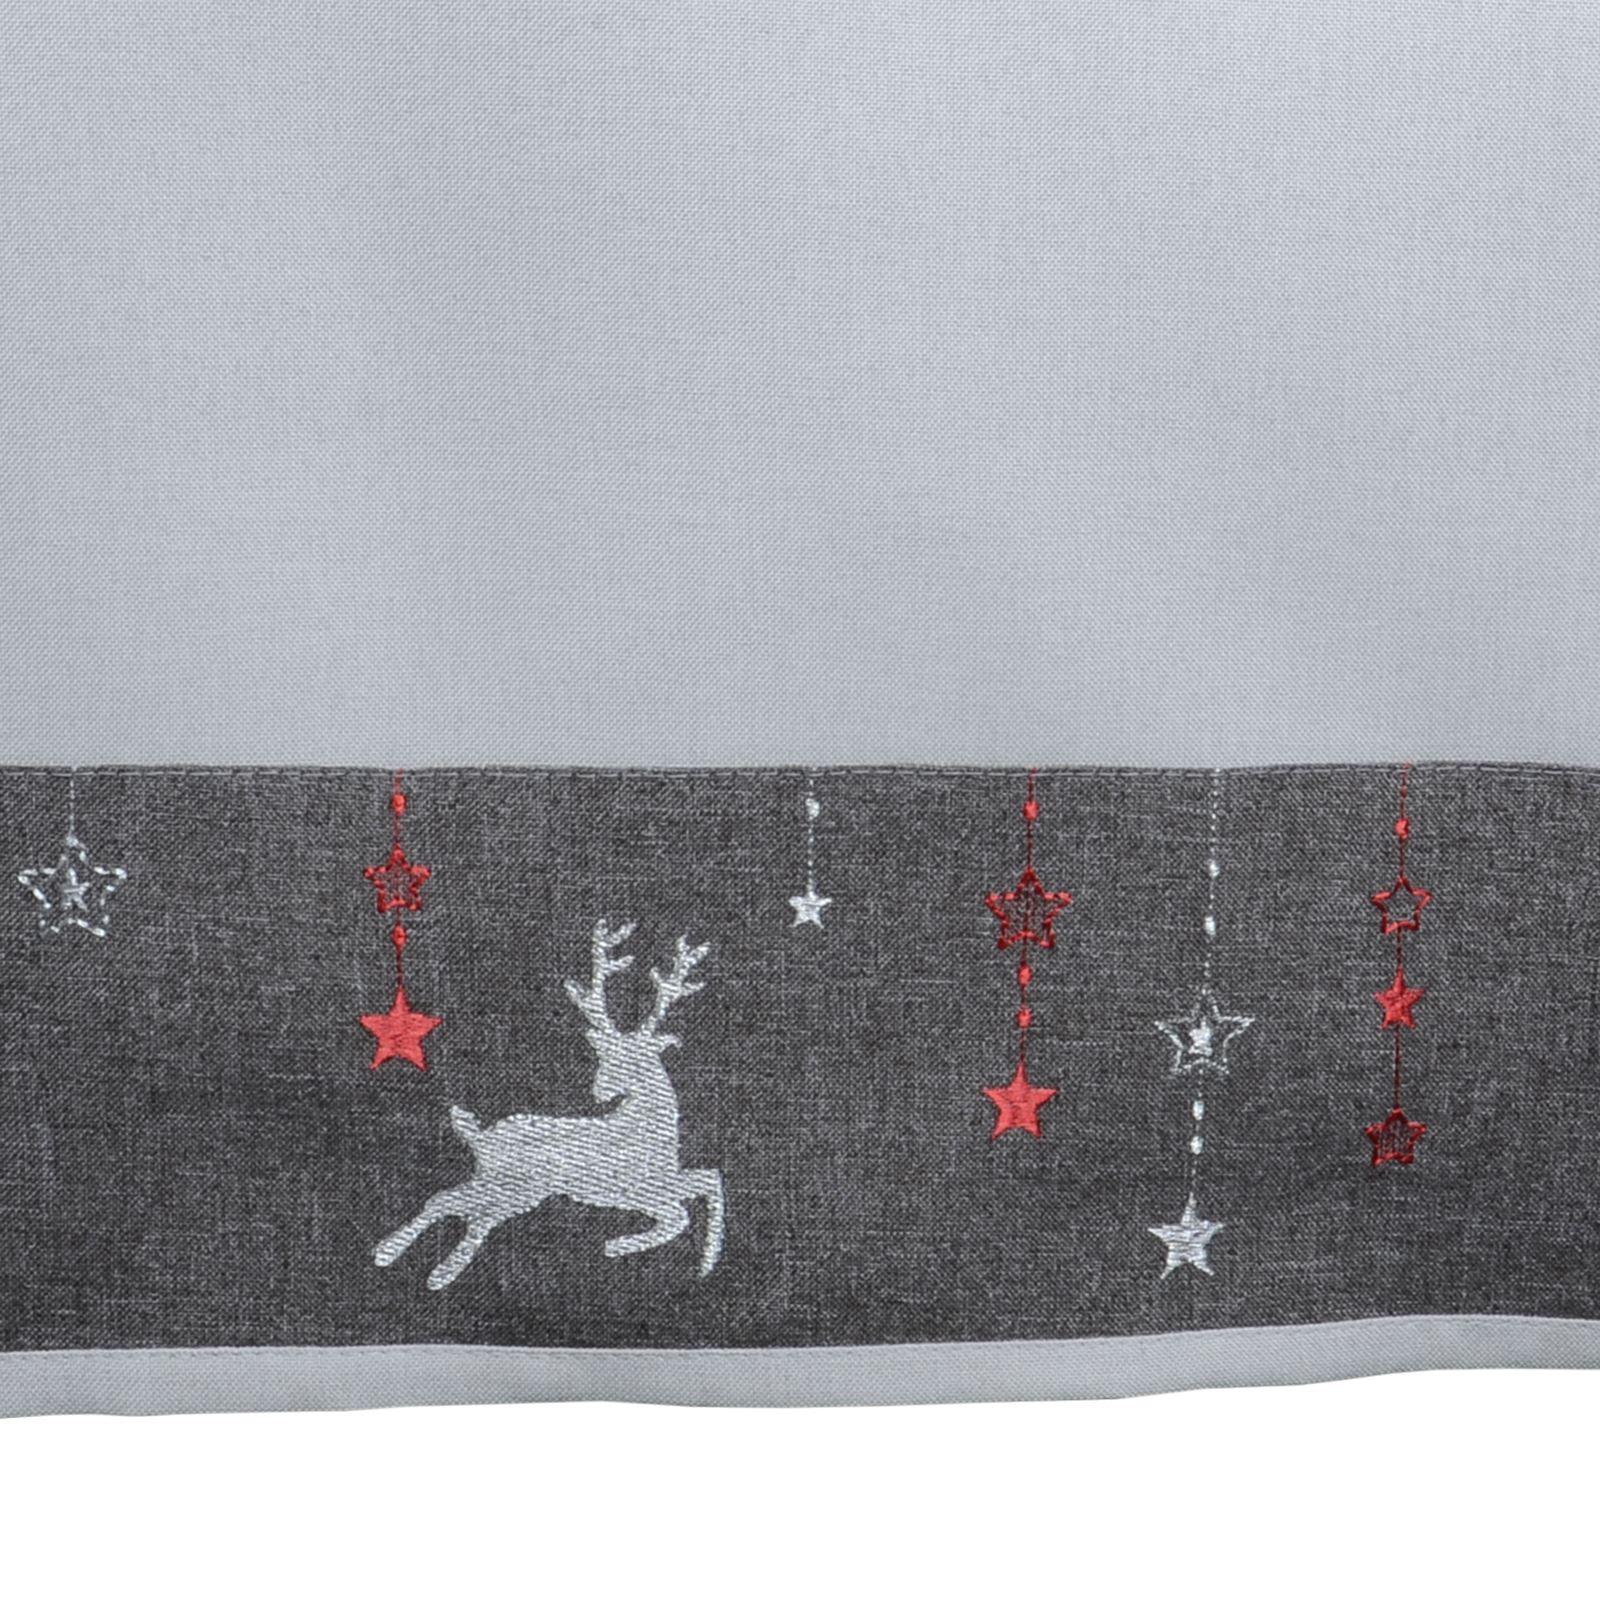 Christmas-Tablecloth-Festive-Pattern-Rectangle-Round-Fabric-Xmas-Room-Decoration Indexbild 60